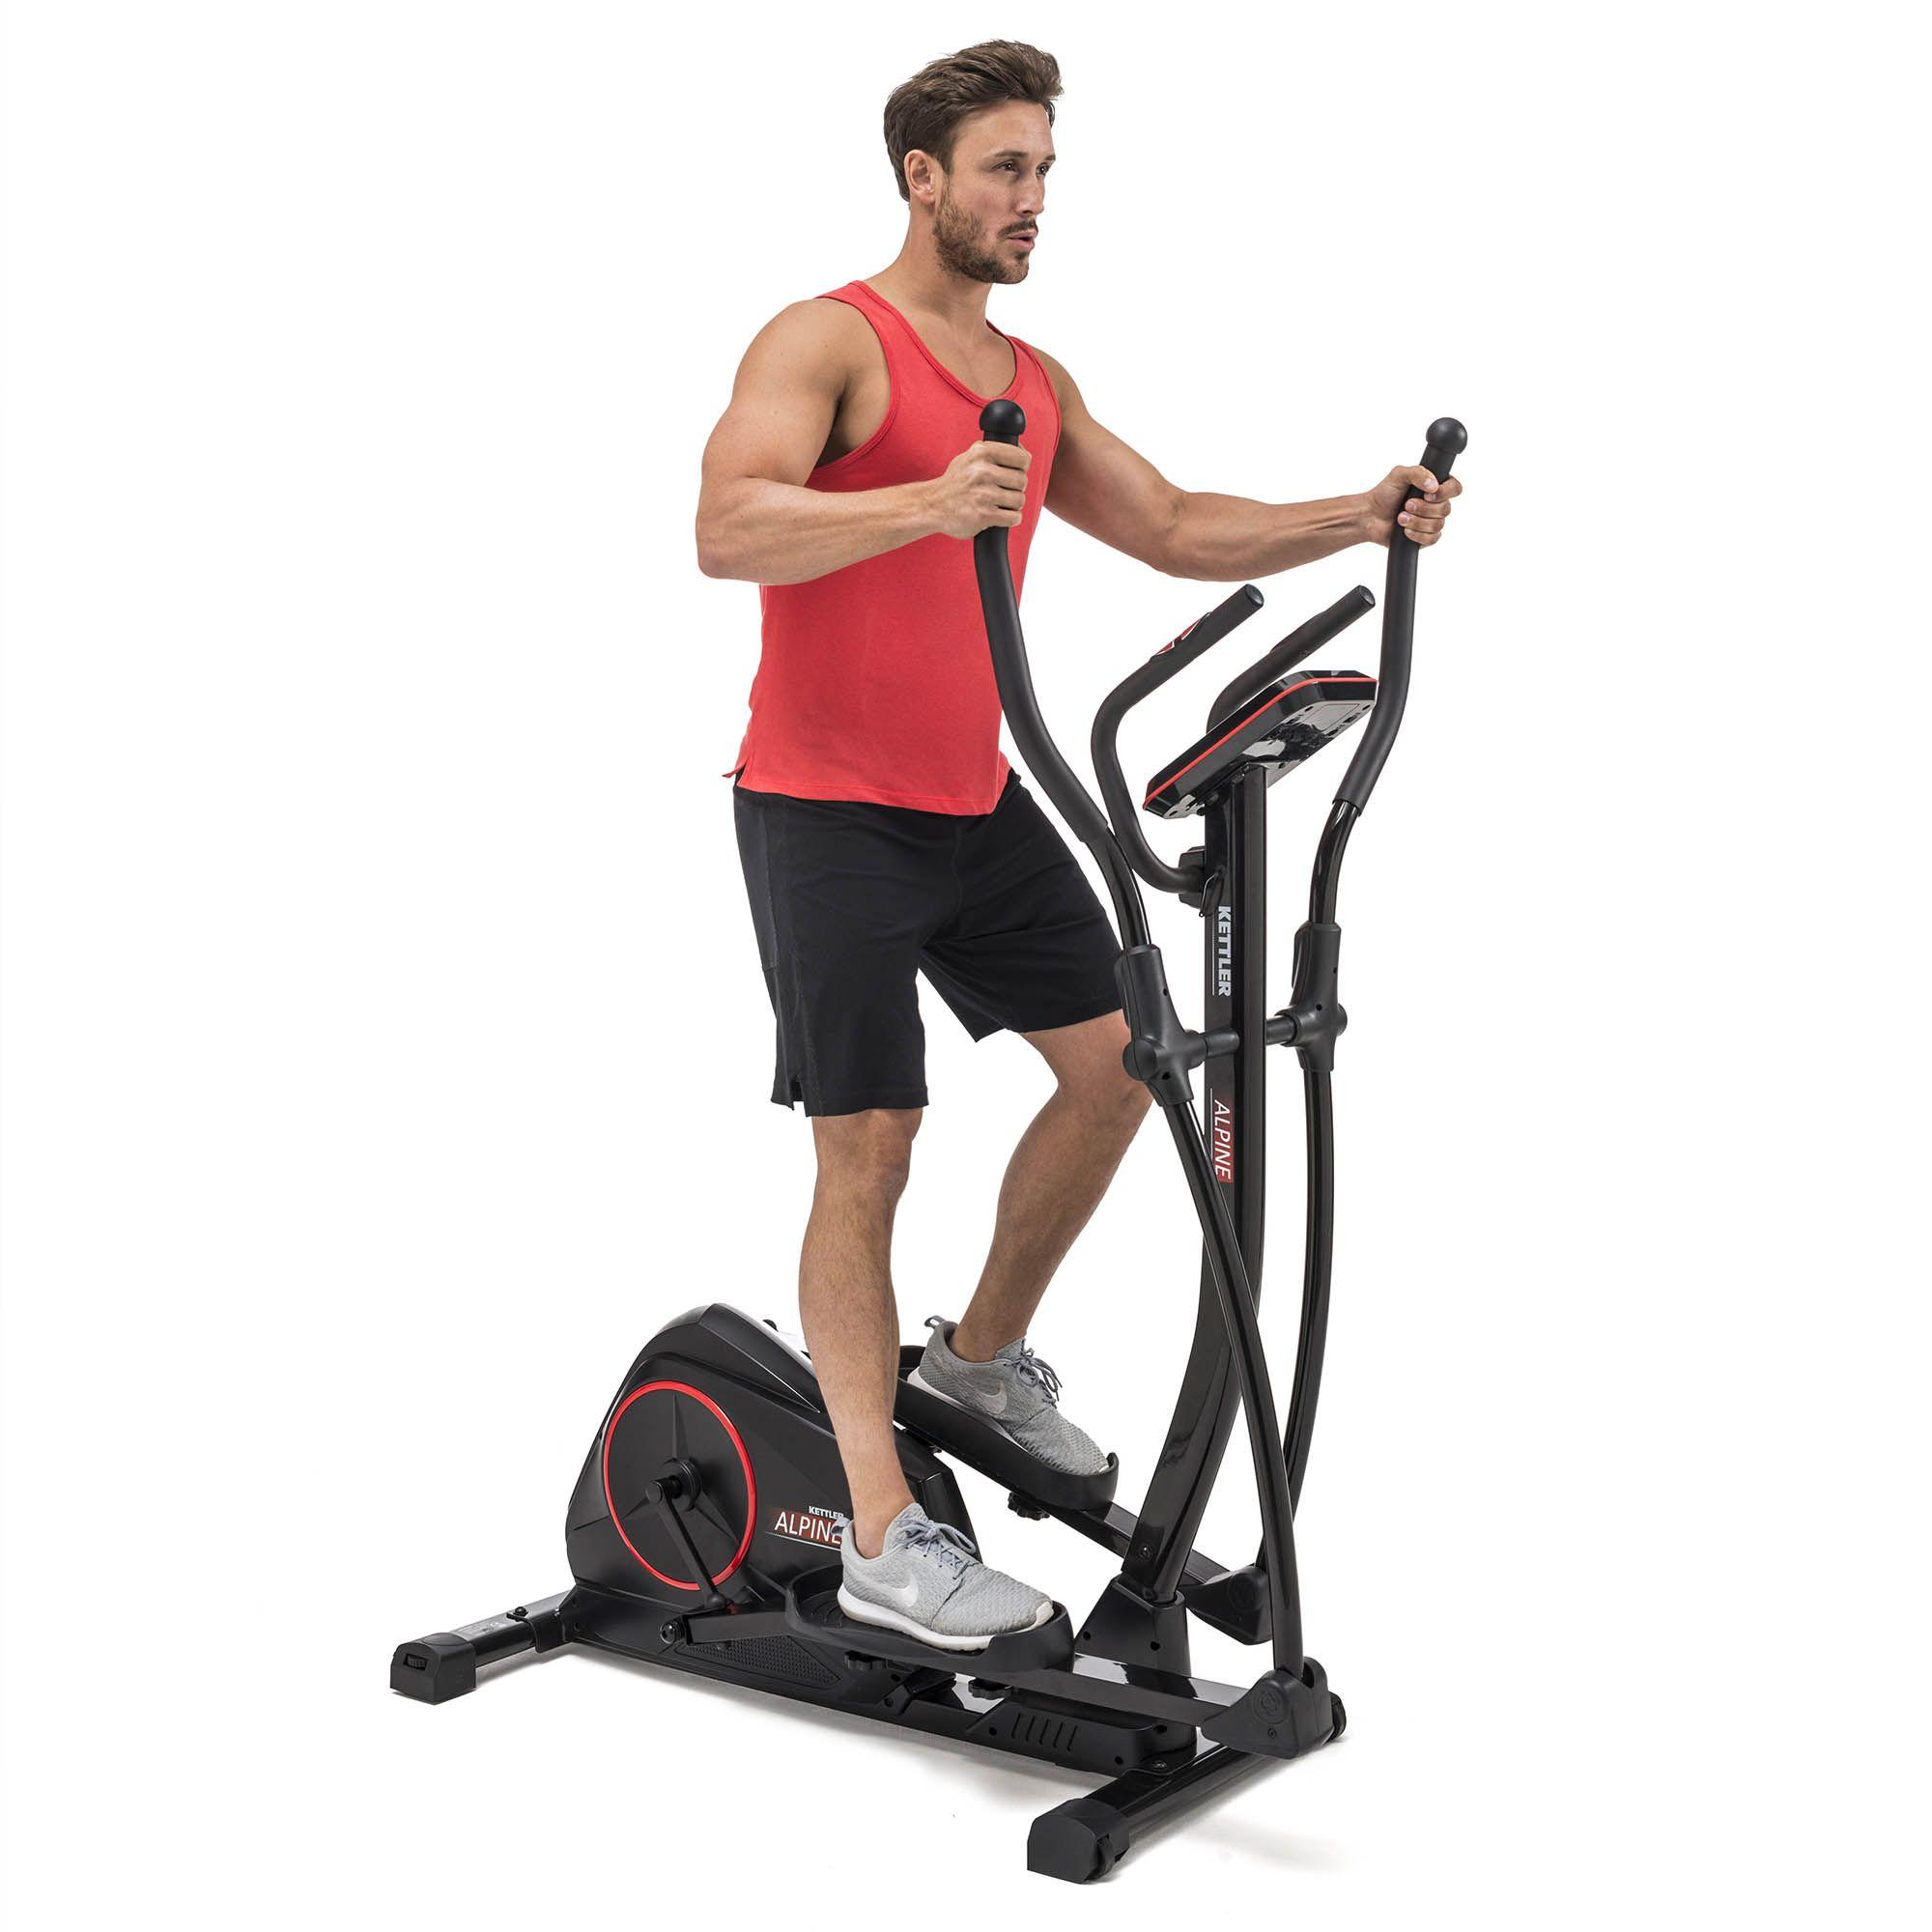 Kettler Alpine Elliptical Cross Trainer Sweatband Com